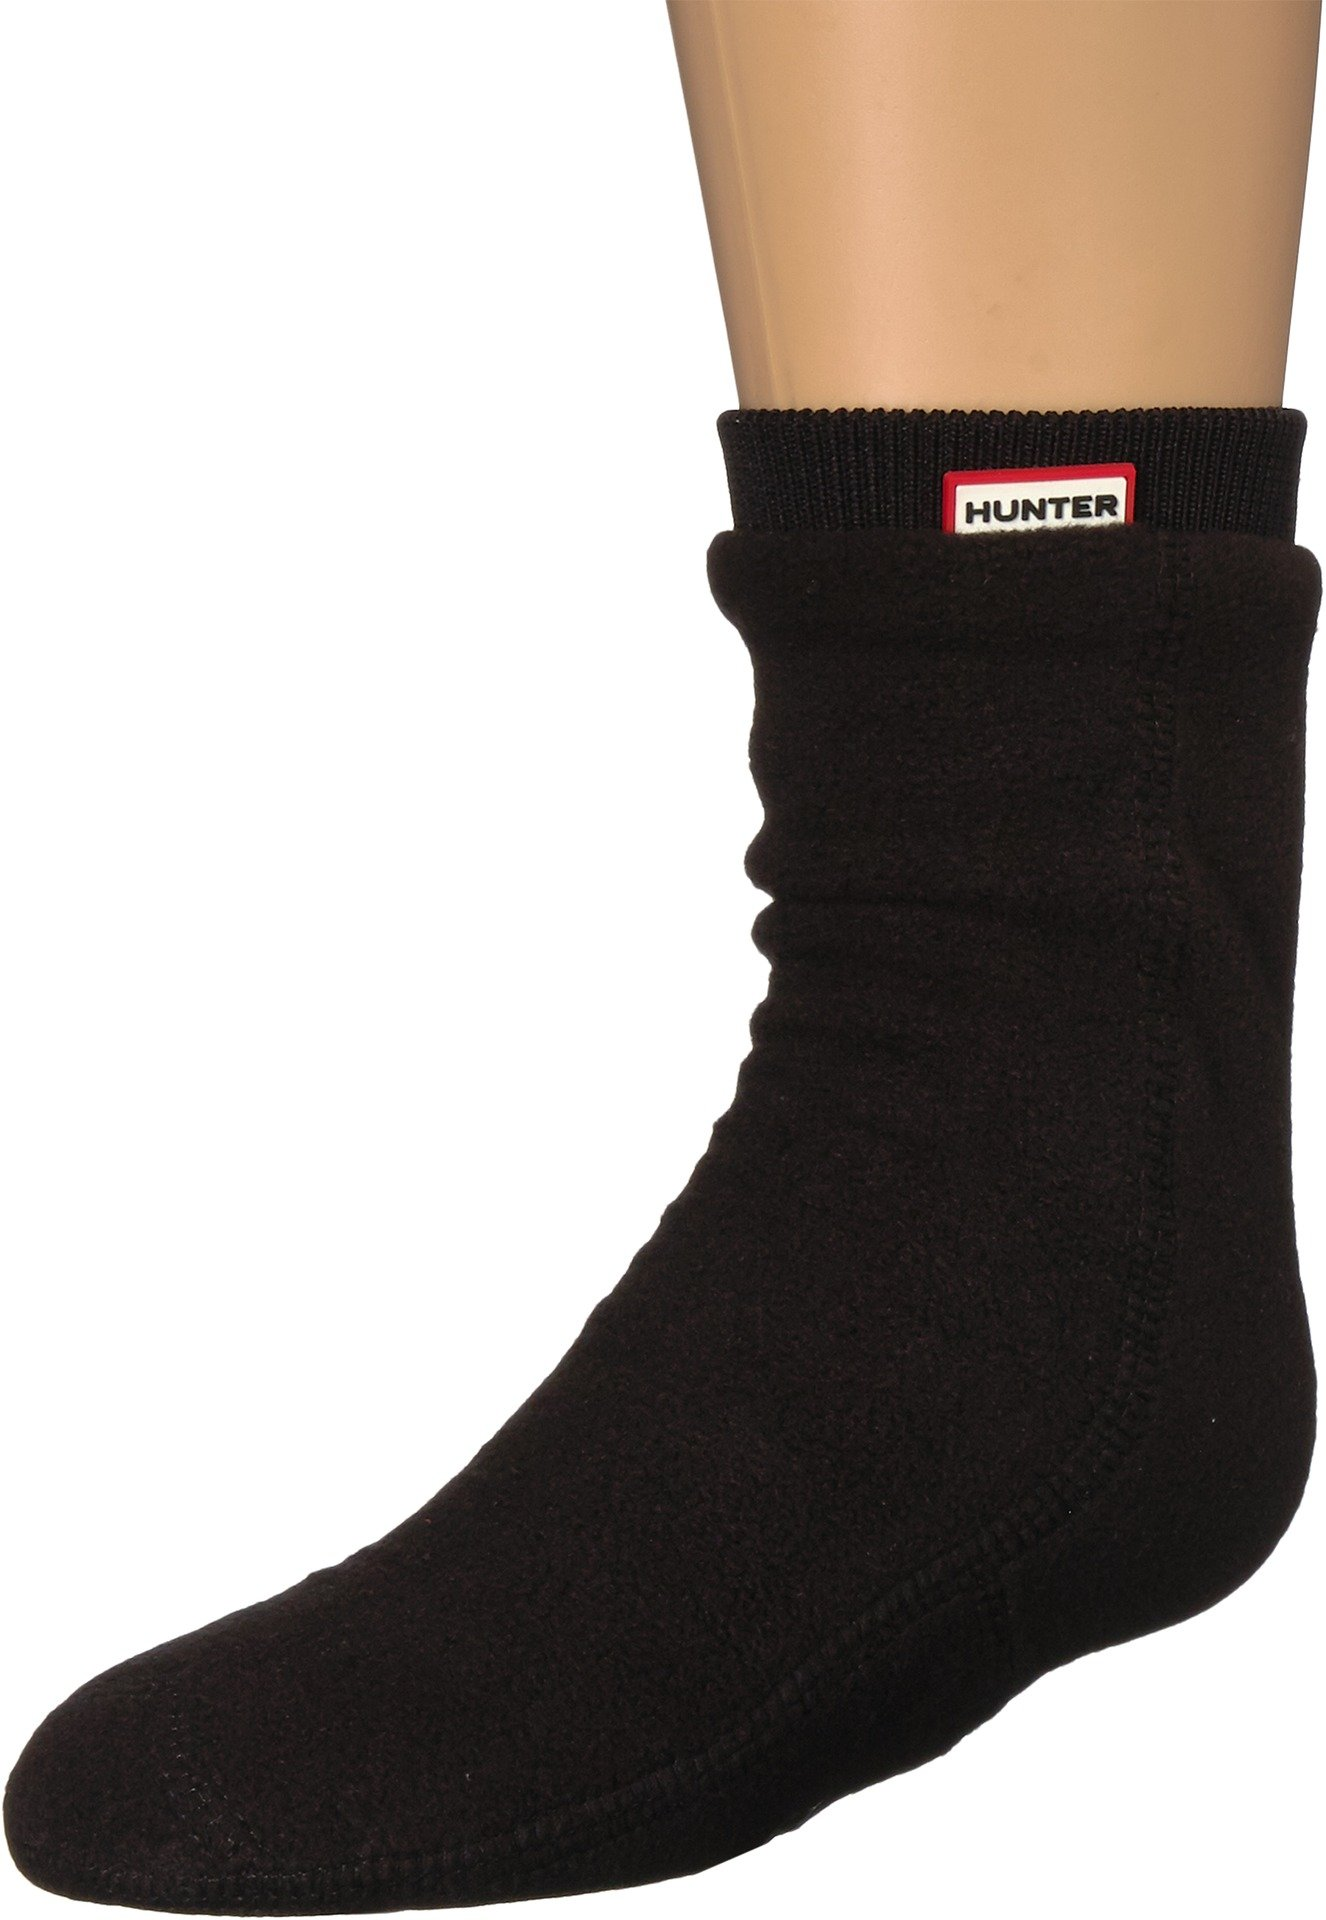 Hunter Kids Unisex Original Fitted Boot Socks (Toddler/Little Kid/Big Kid) Black Medium